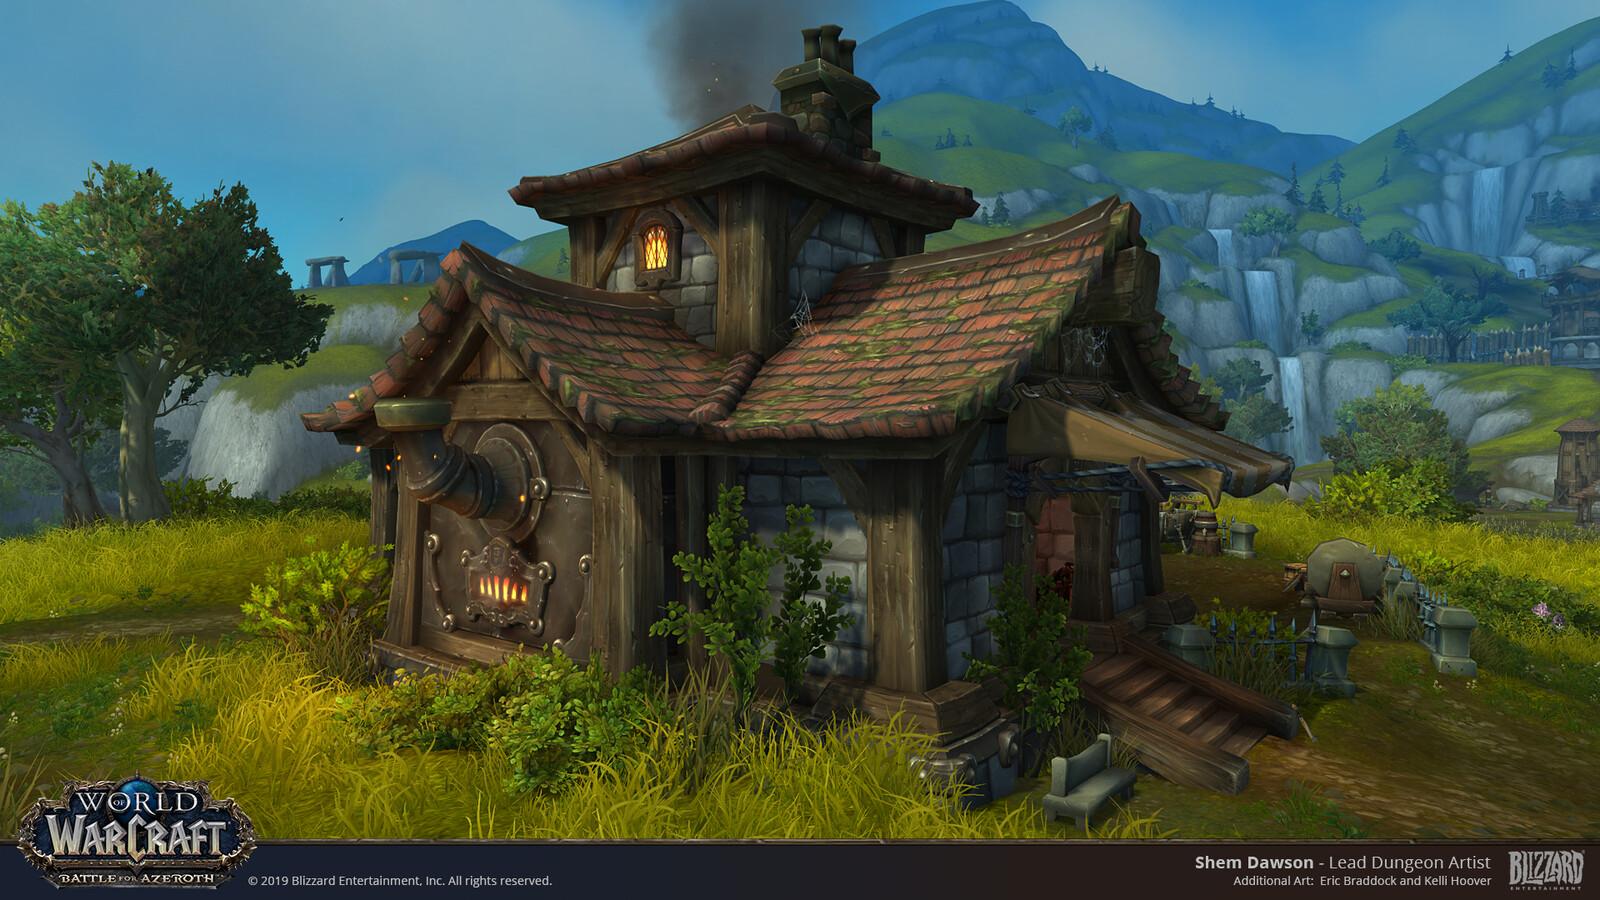 The Blacksmith Area